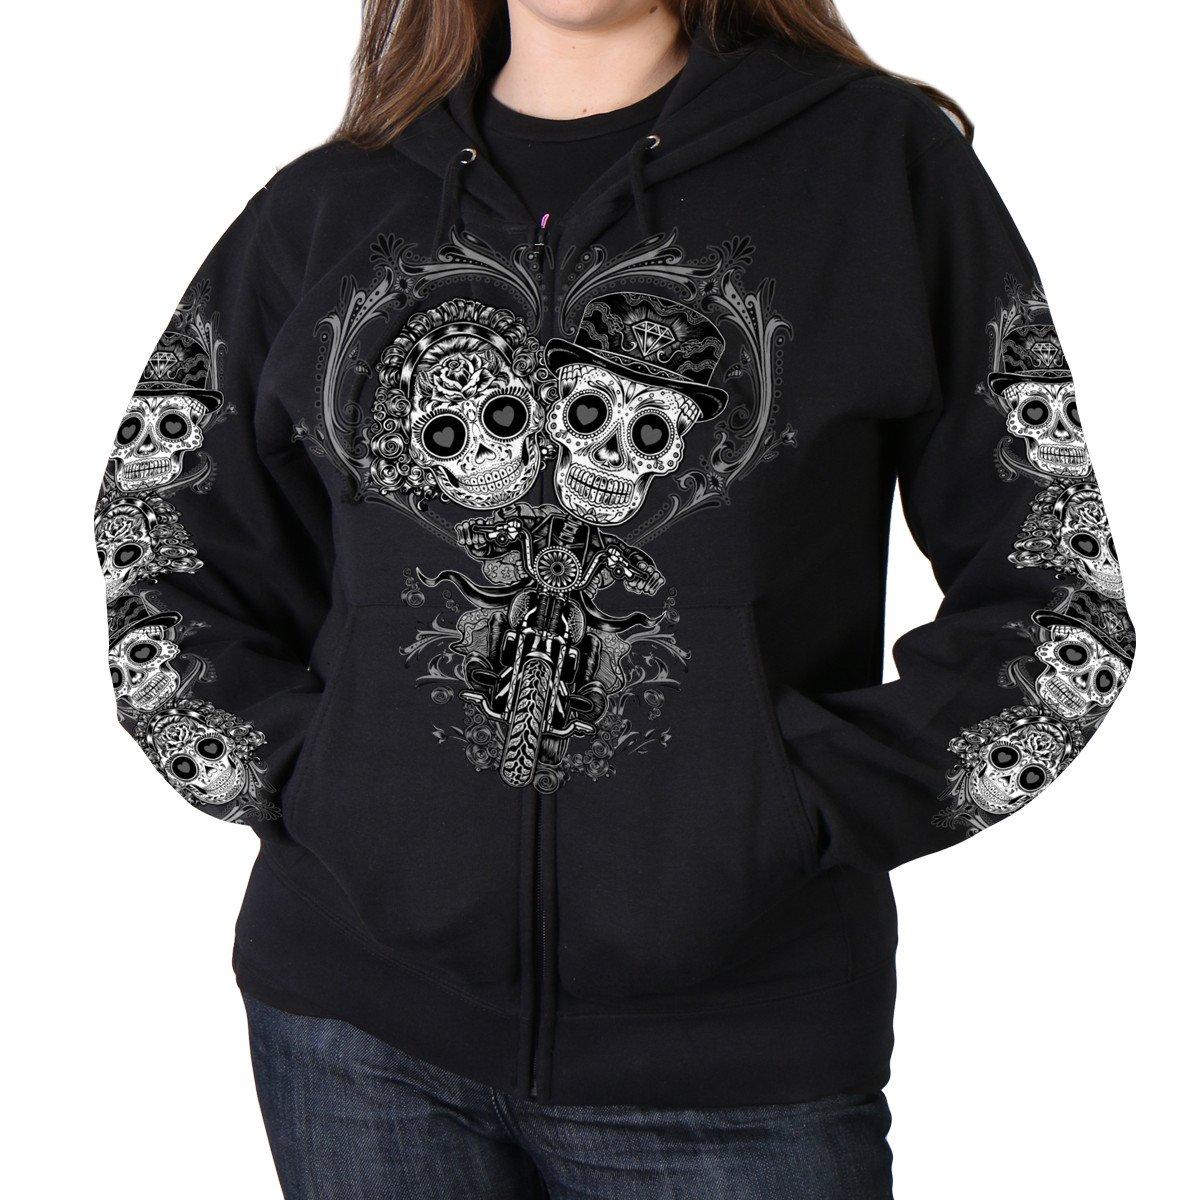 Hot Leathers Sugar Couple Full Cut Women's Hooded sweatshirt (Black, X-Large) 4546